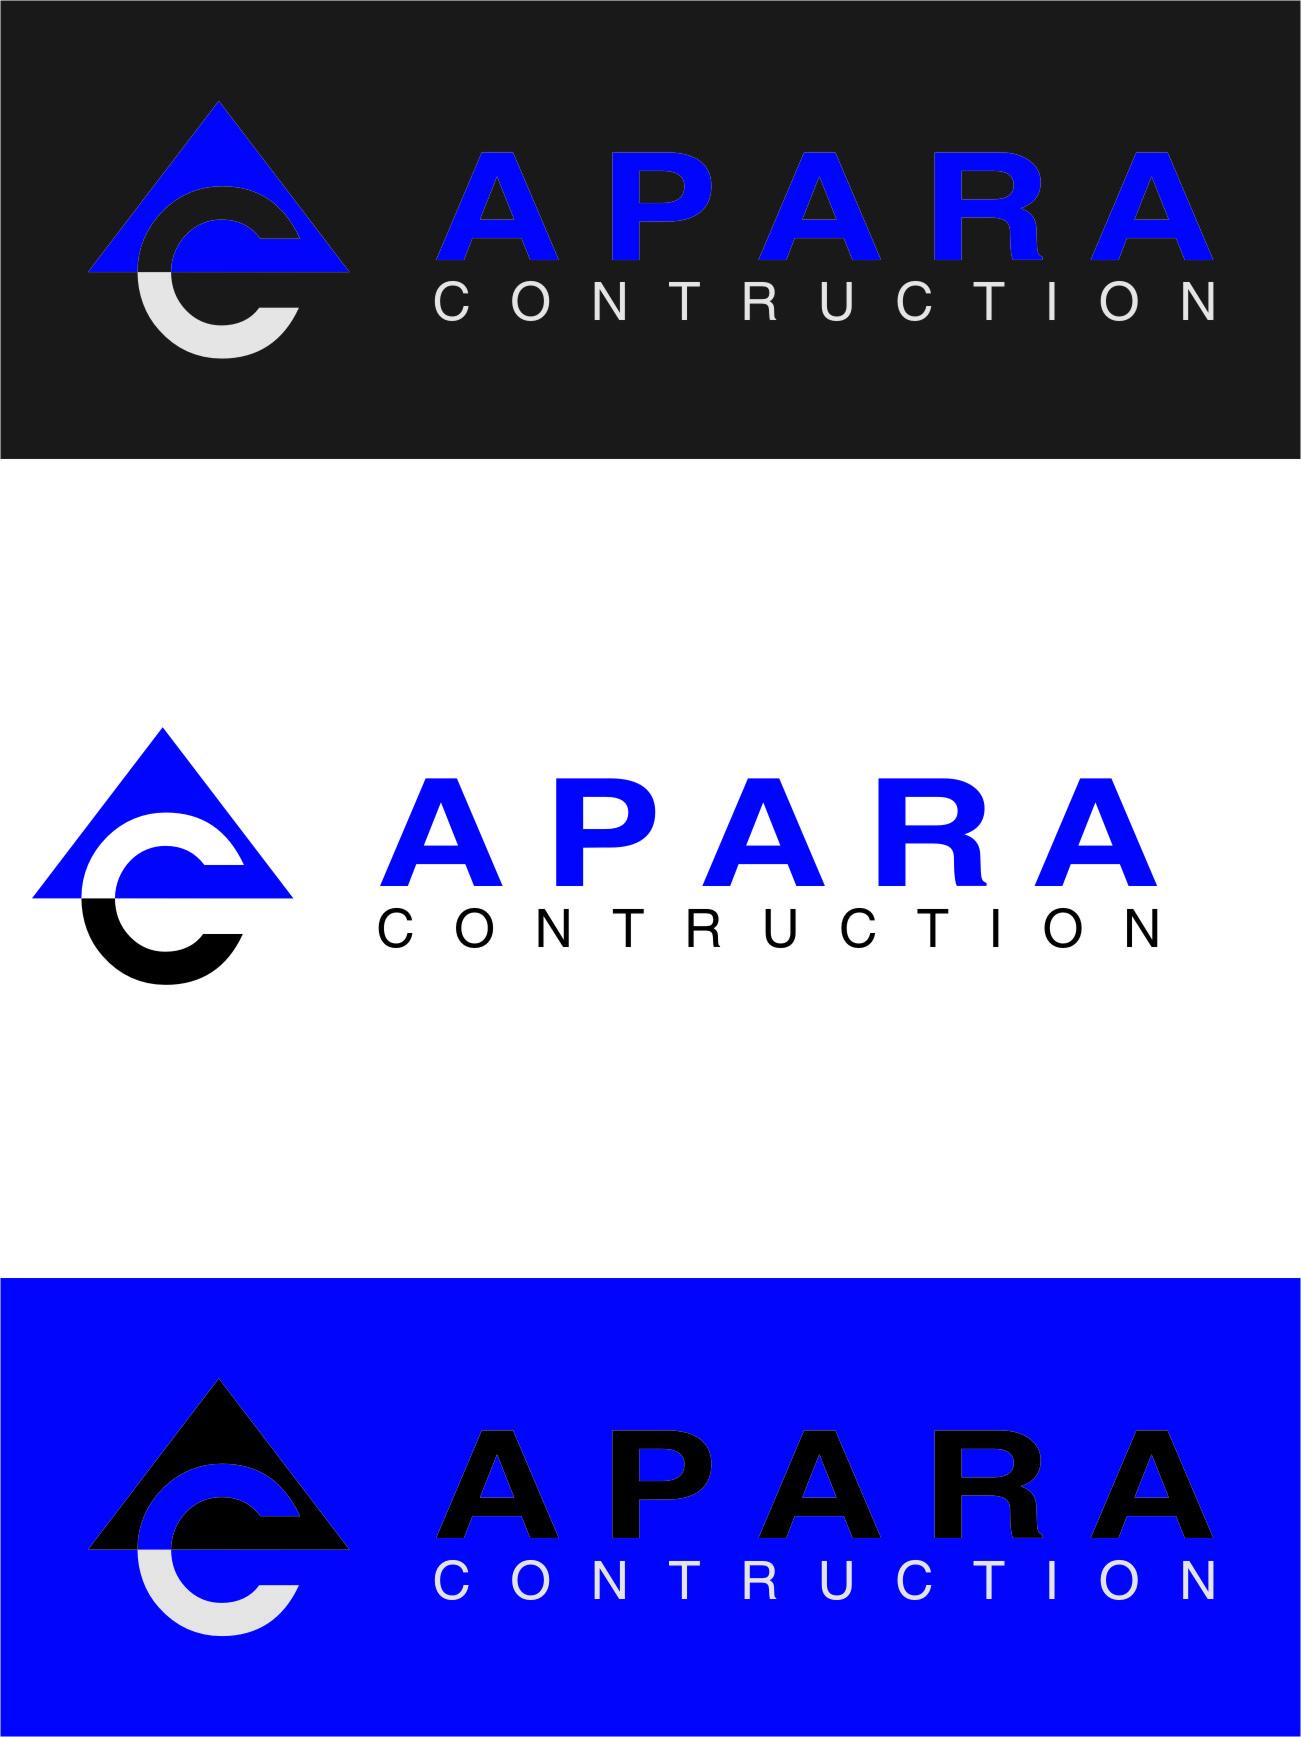 Logo Design by Ngepet_art - Entry No. 199 in the Logo Design Contest Apara Construction Logo Design.